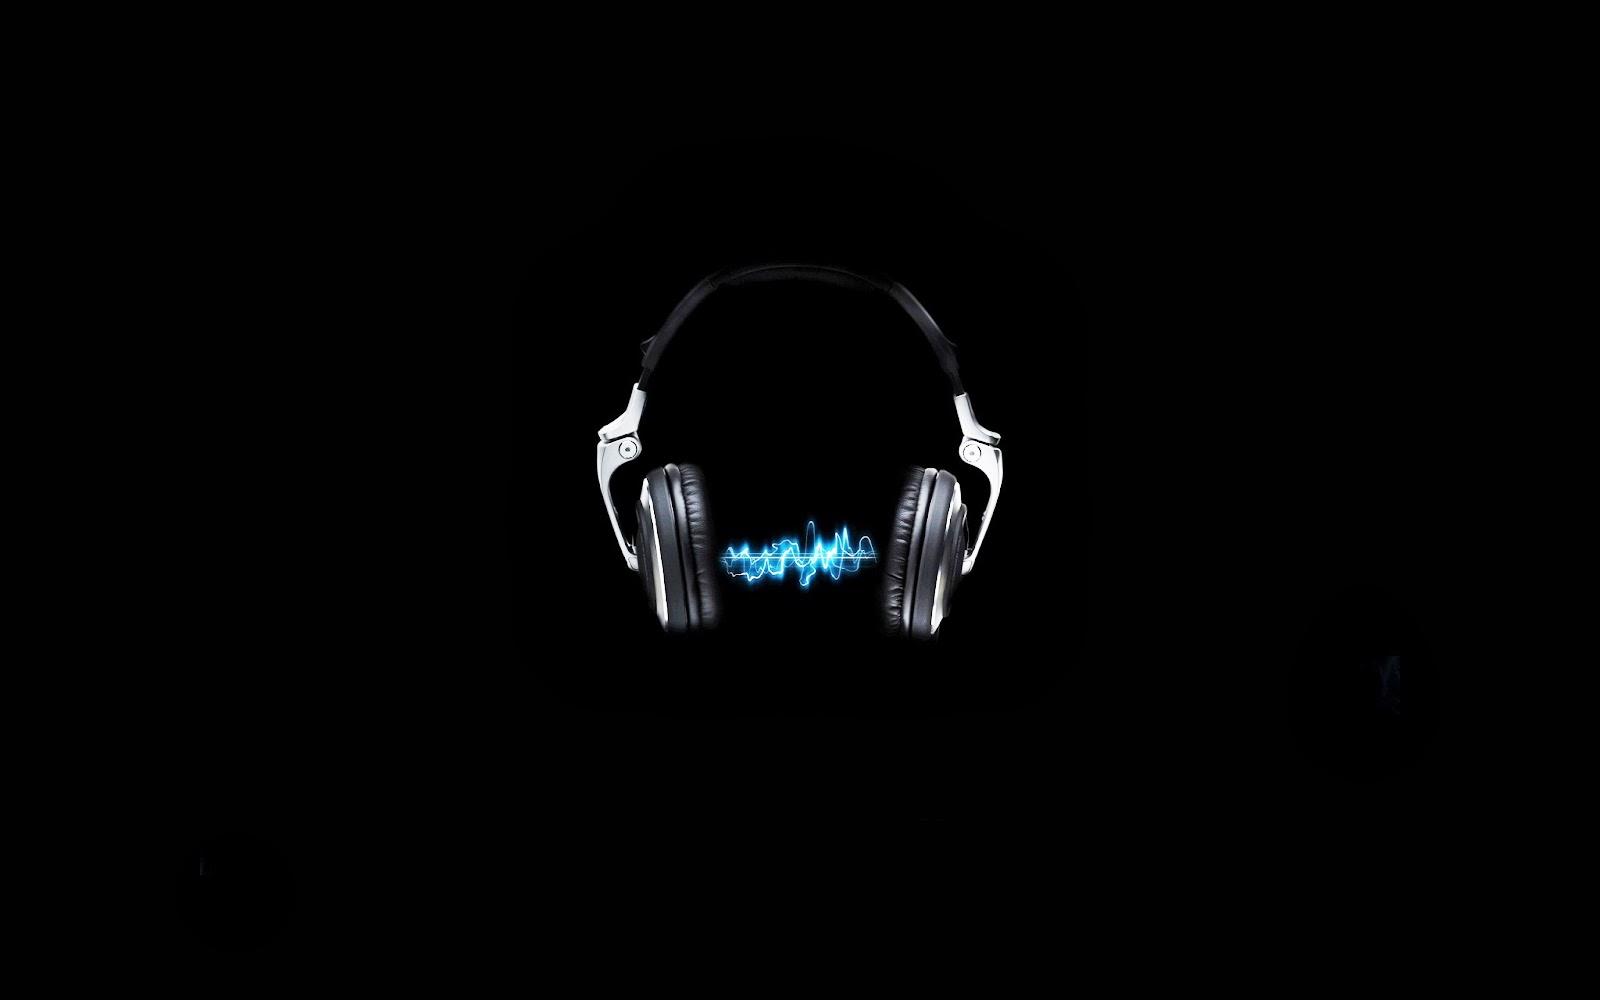 Electronic Base Headphones Desktop Wallpapers and Backgrounds 1600x1000